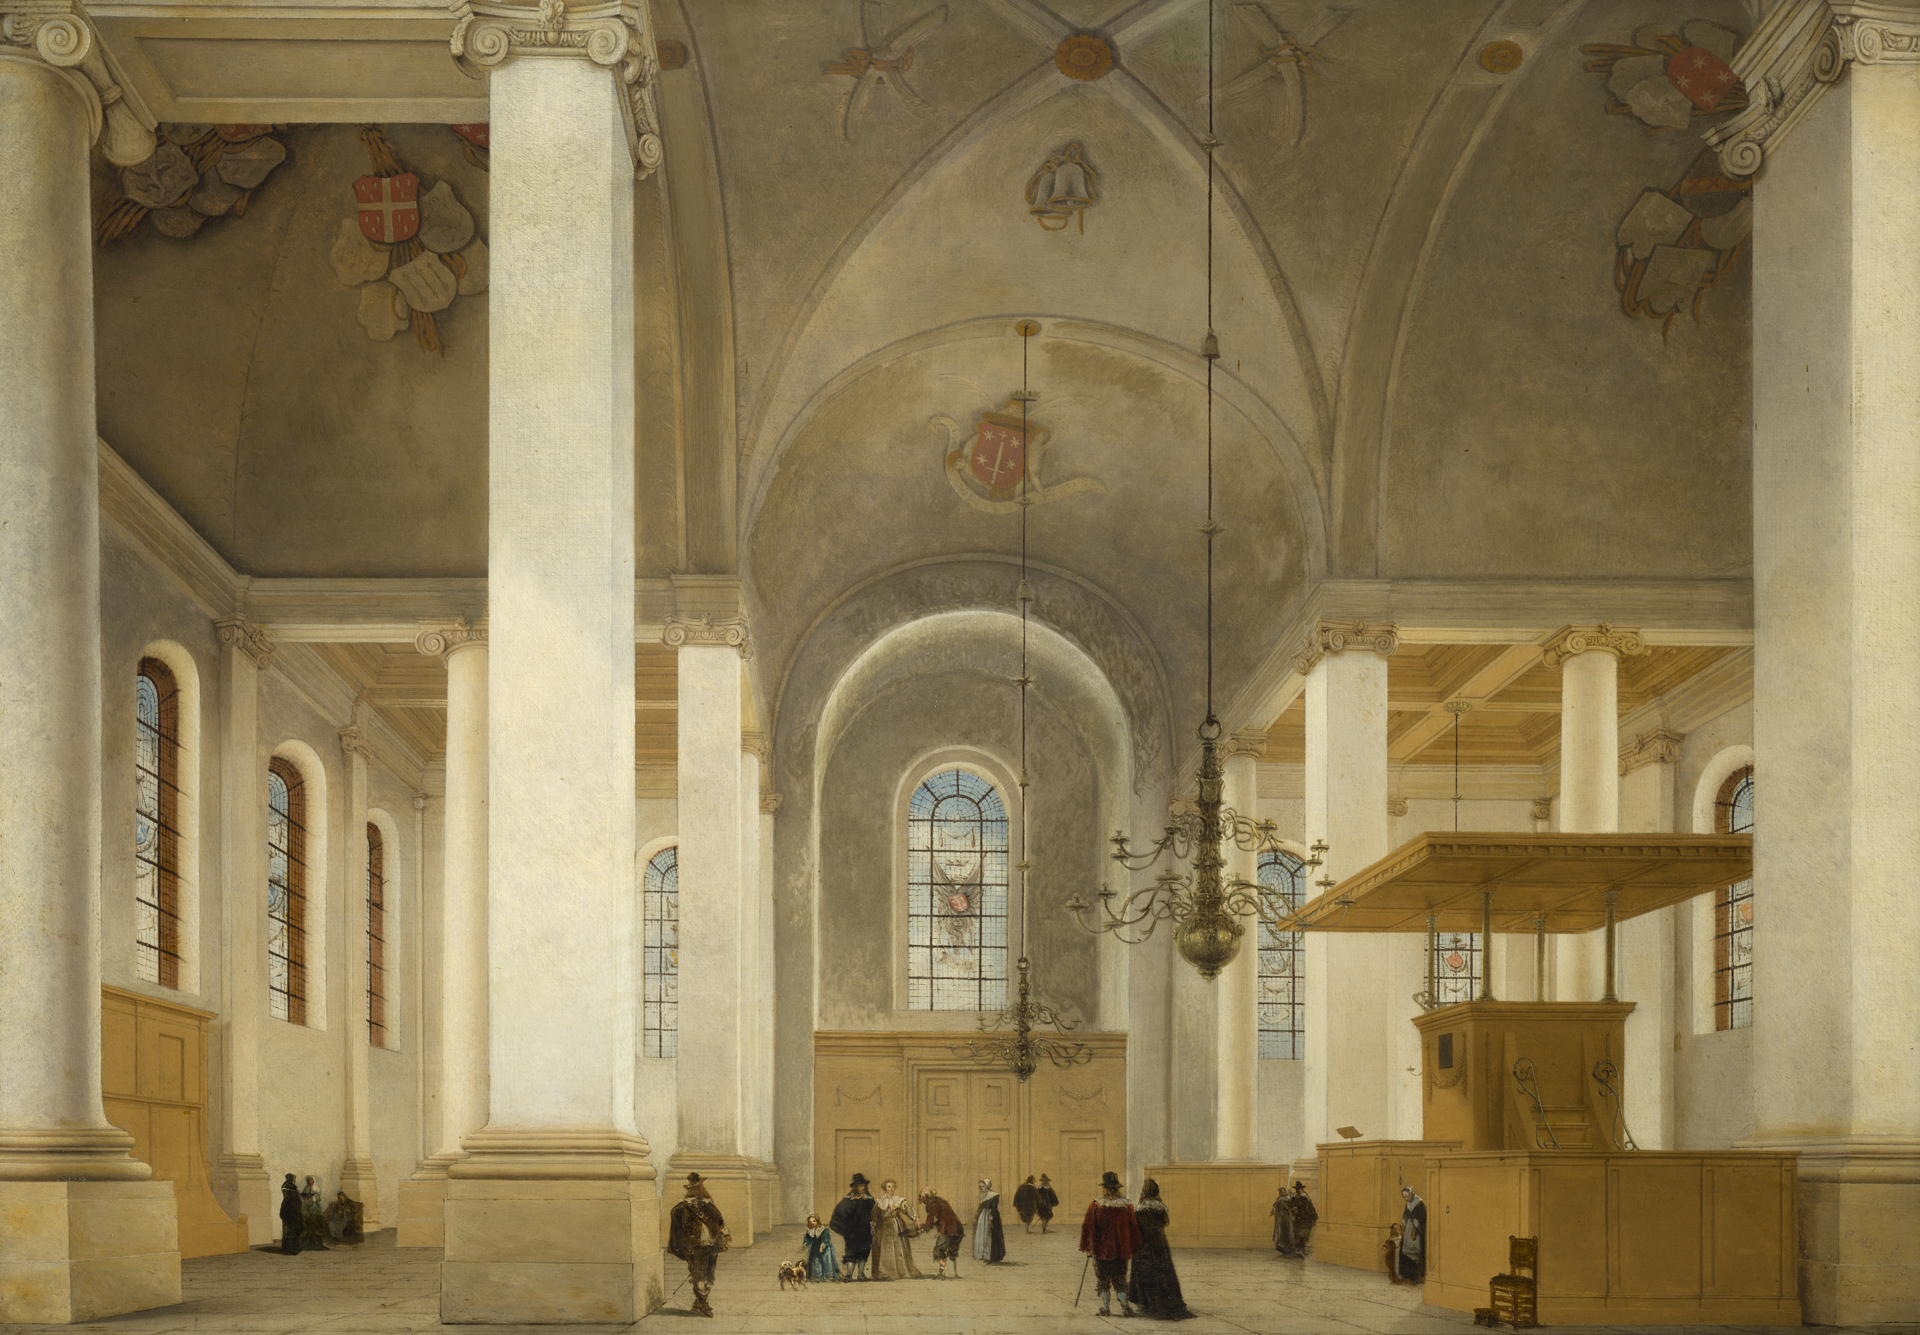 interieur van de nieuwe kerk te haarlem interieur van de nieuwe kerk te haarlem